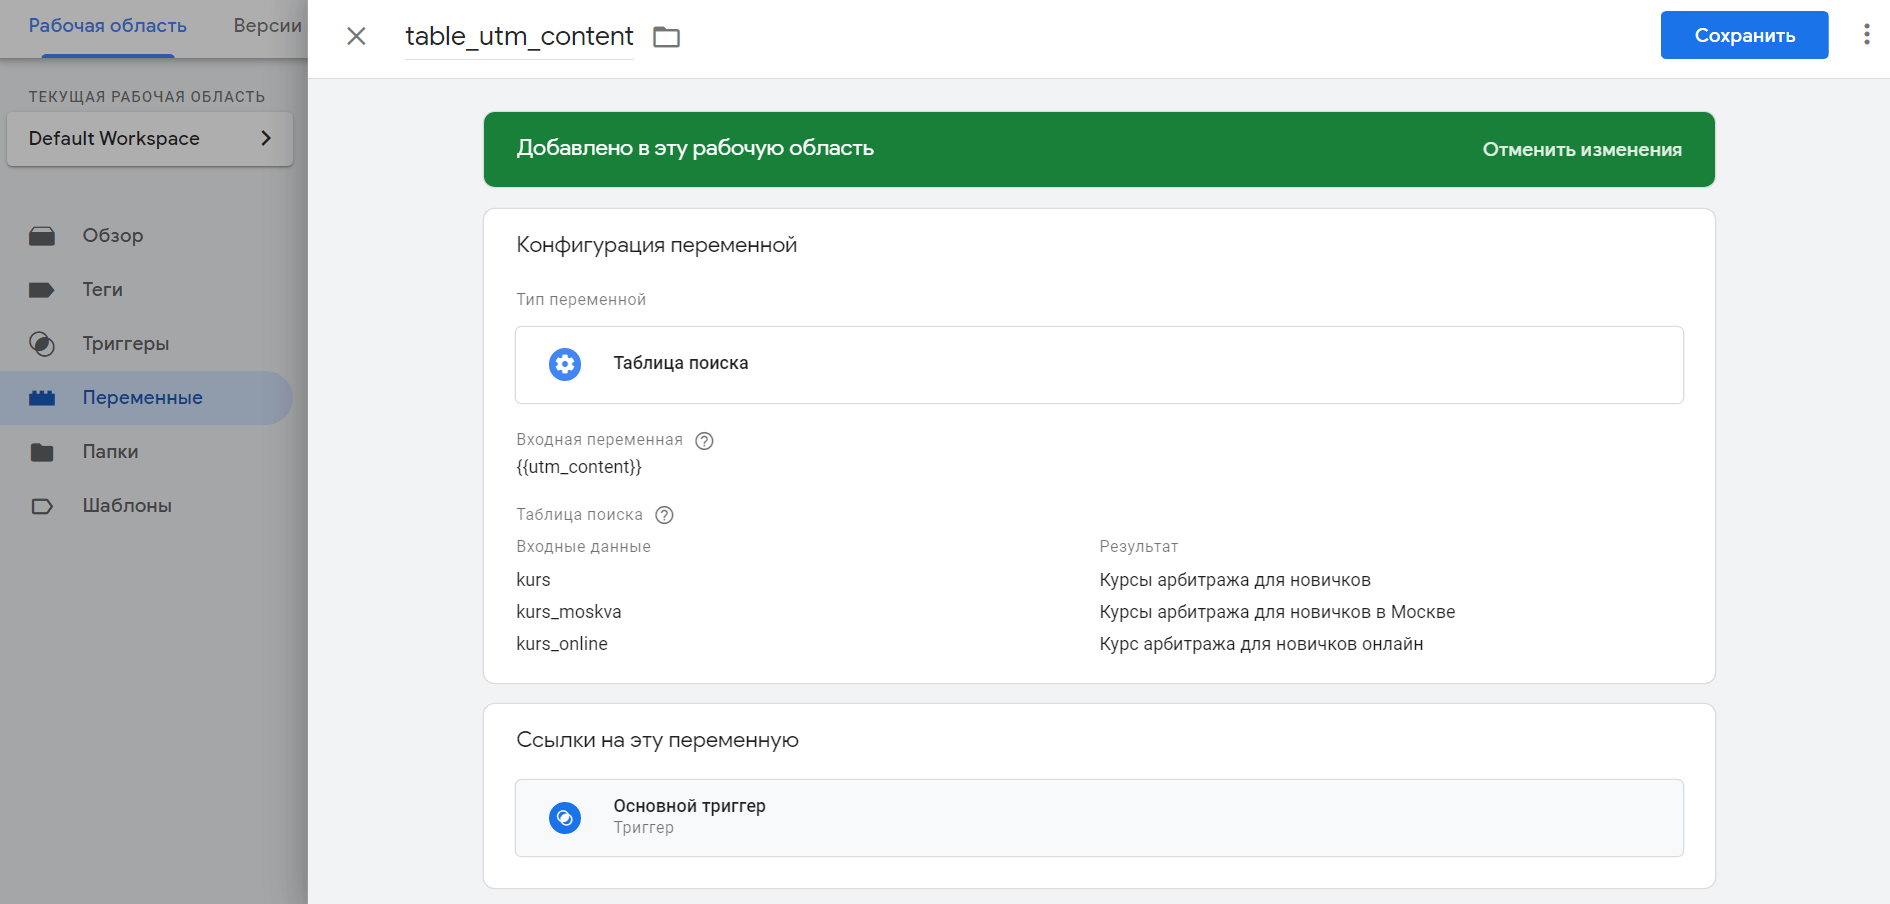 Создайте переменную типа «Таблица поиска»